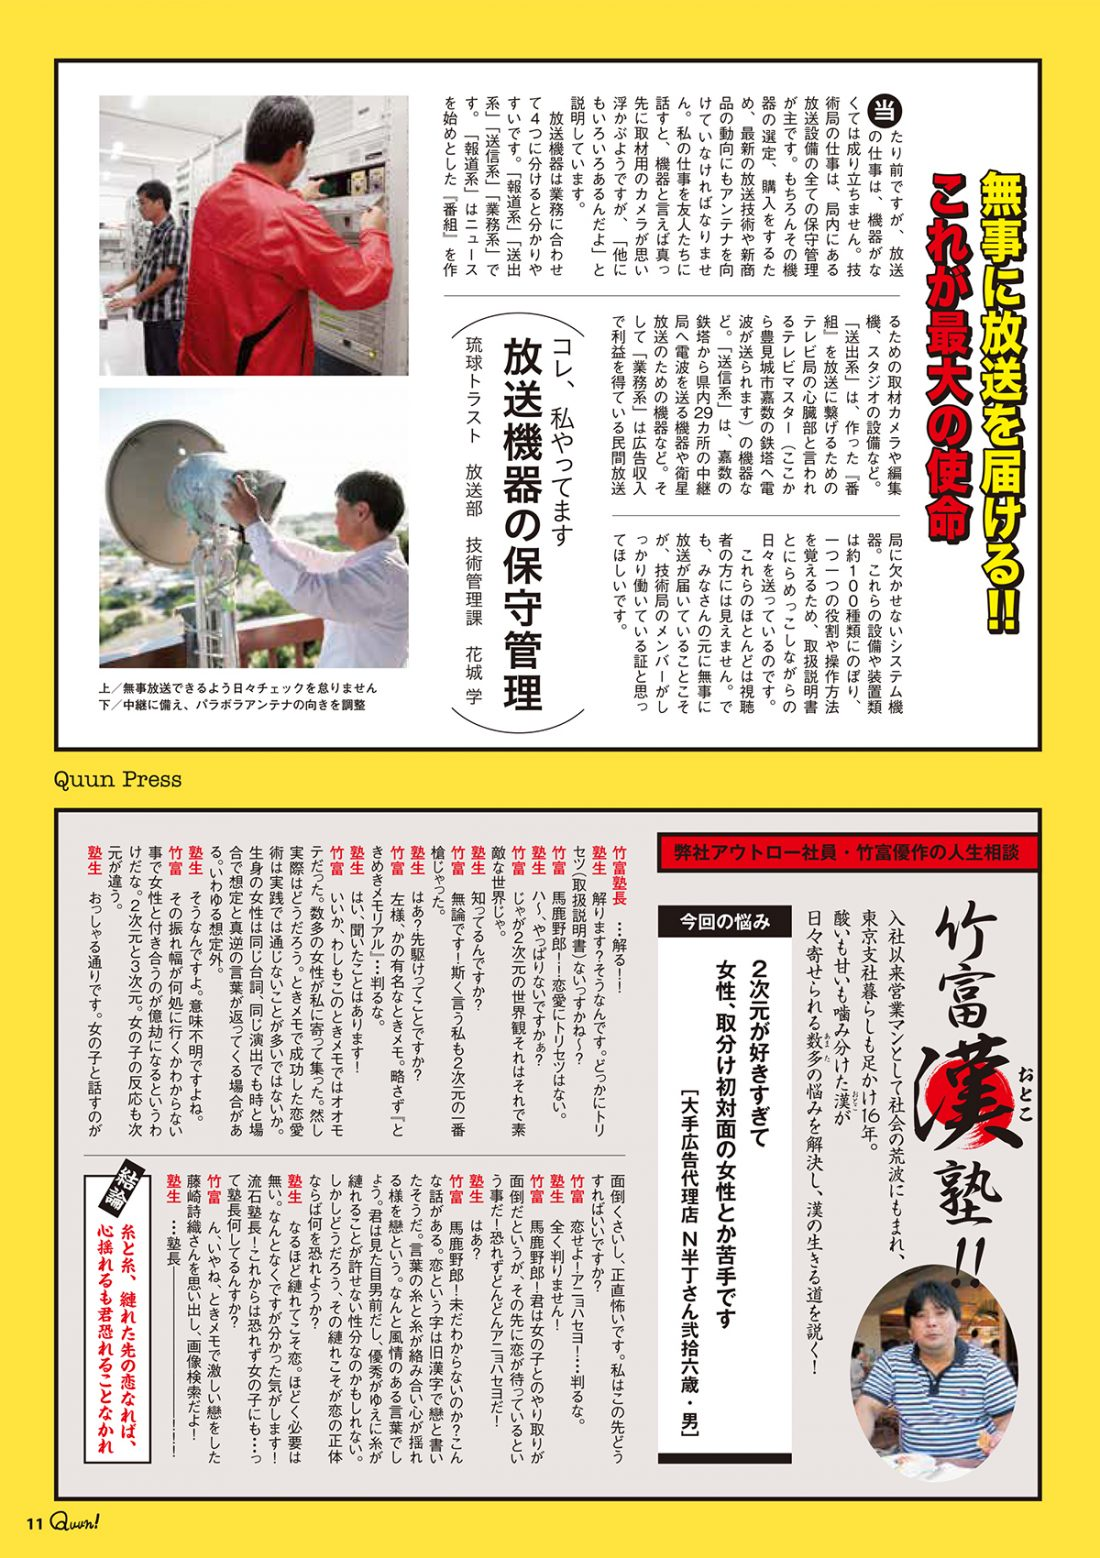 https://www.qab.co.jp/qgoro/wp-content/uploads/quun_0913-1100x1558.jpg